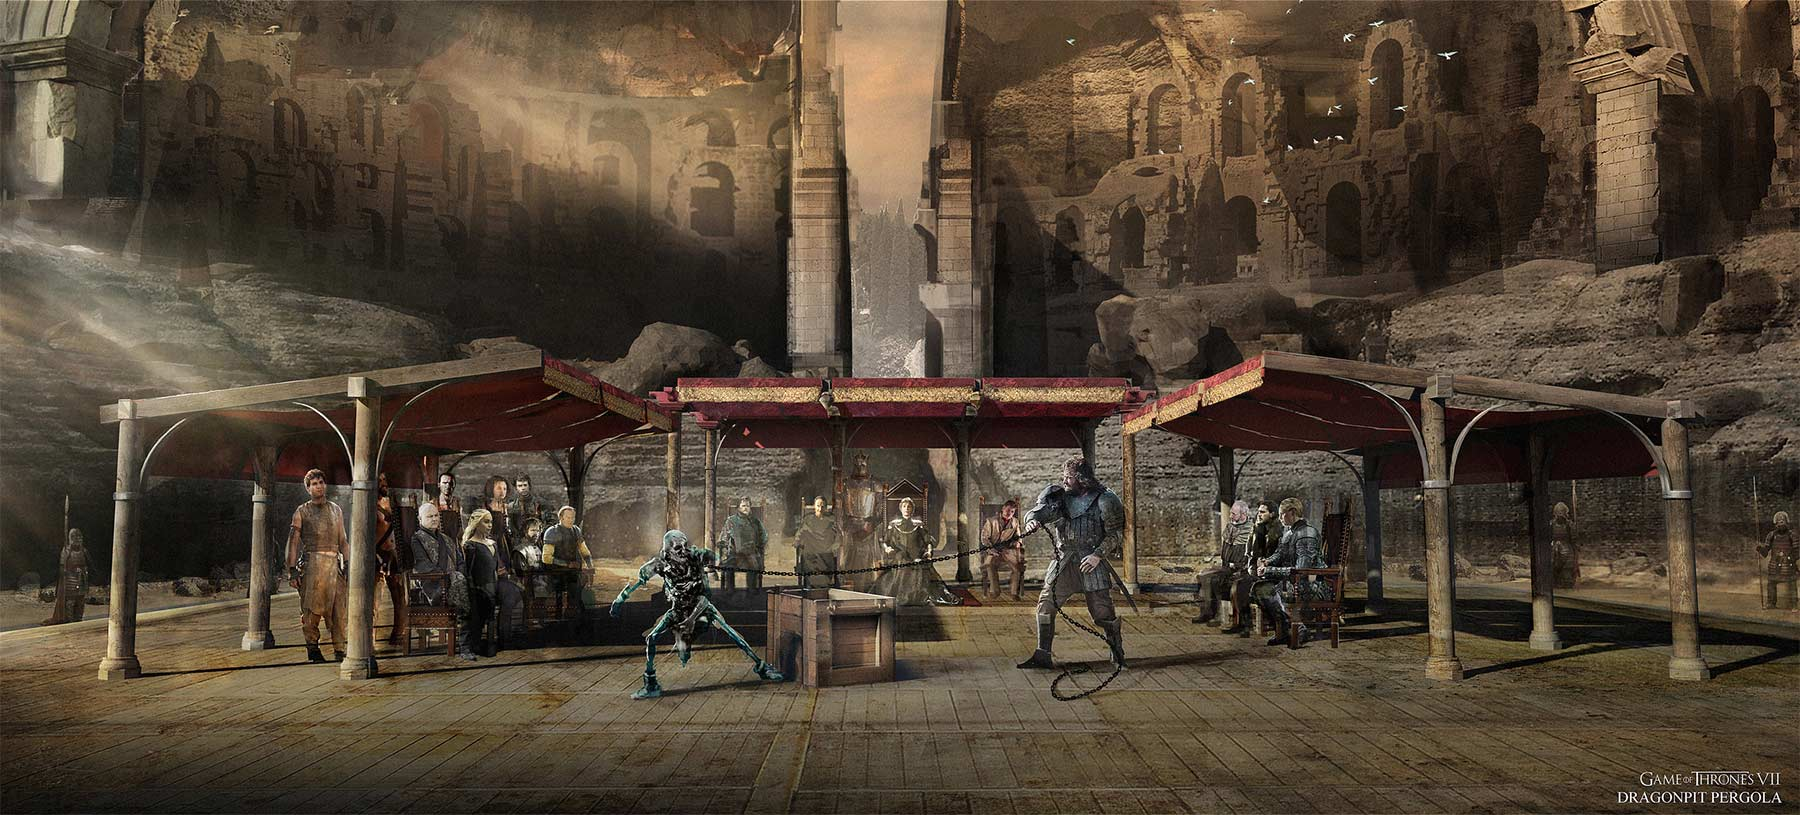 Game of Thrones Staffel 7 Concept Art Kieran-Belshaw-game-of-thrones-concept-art_11